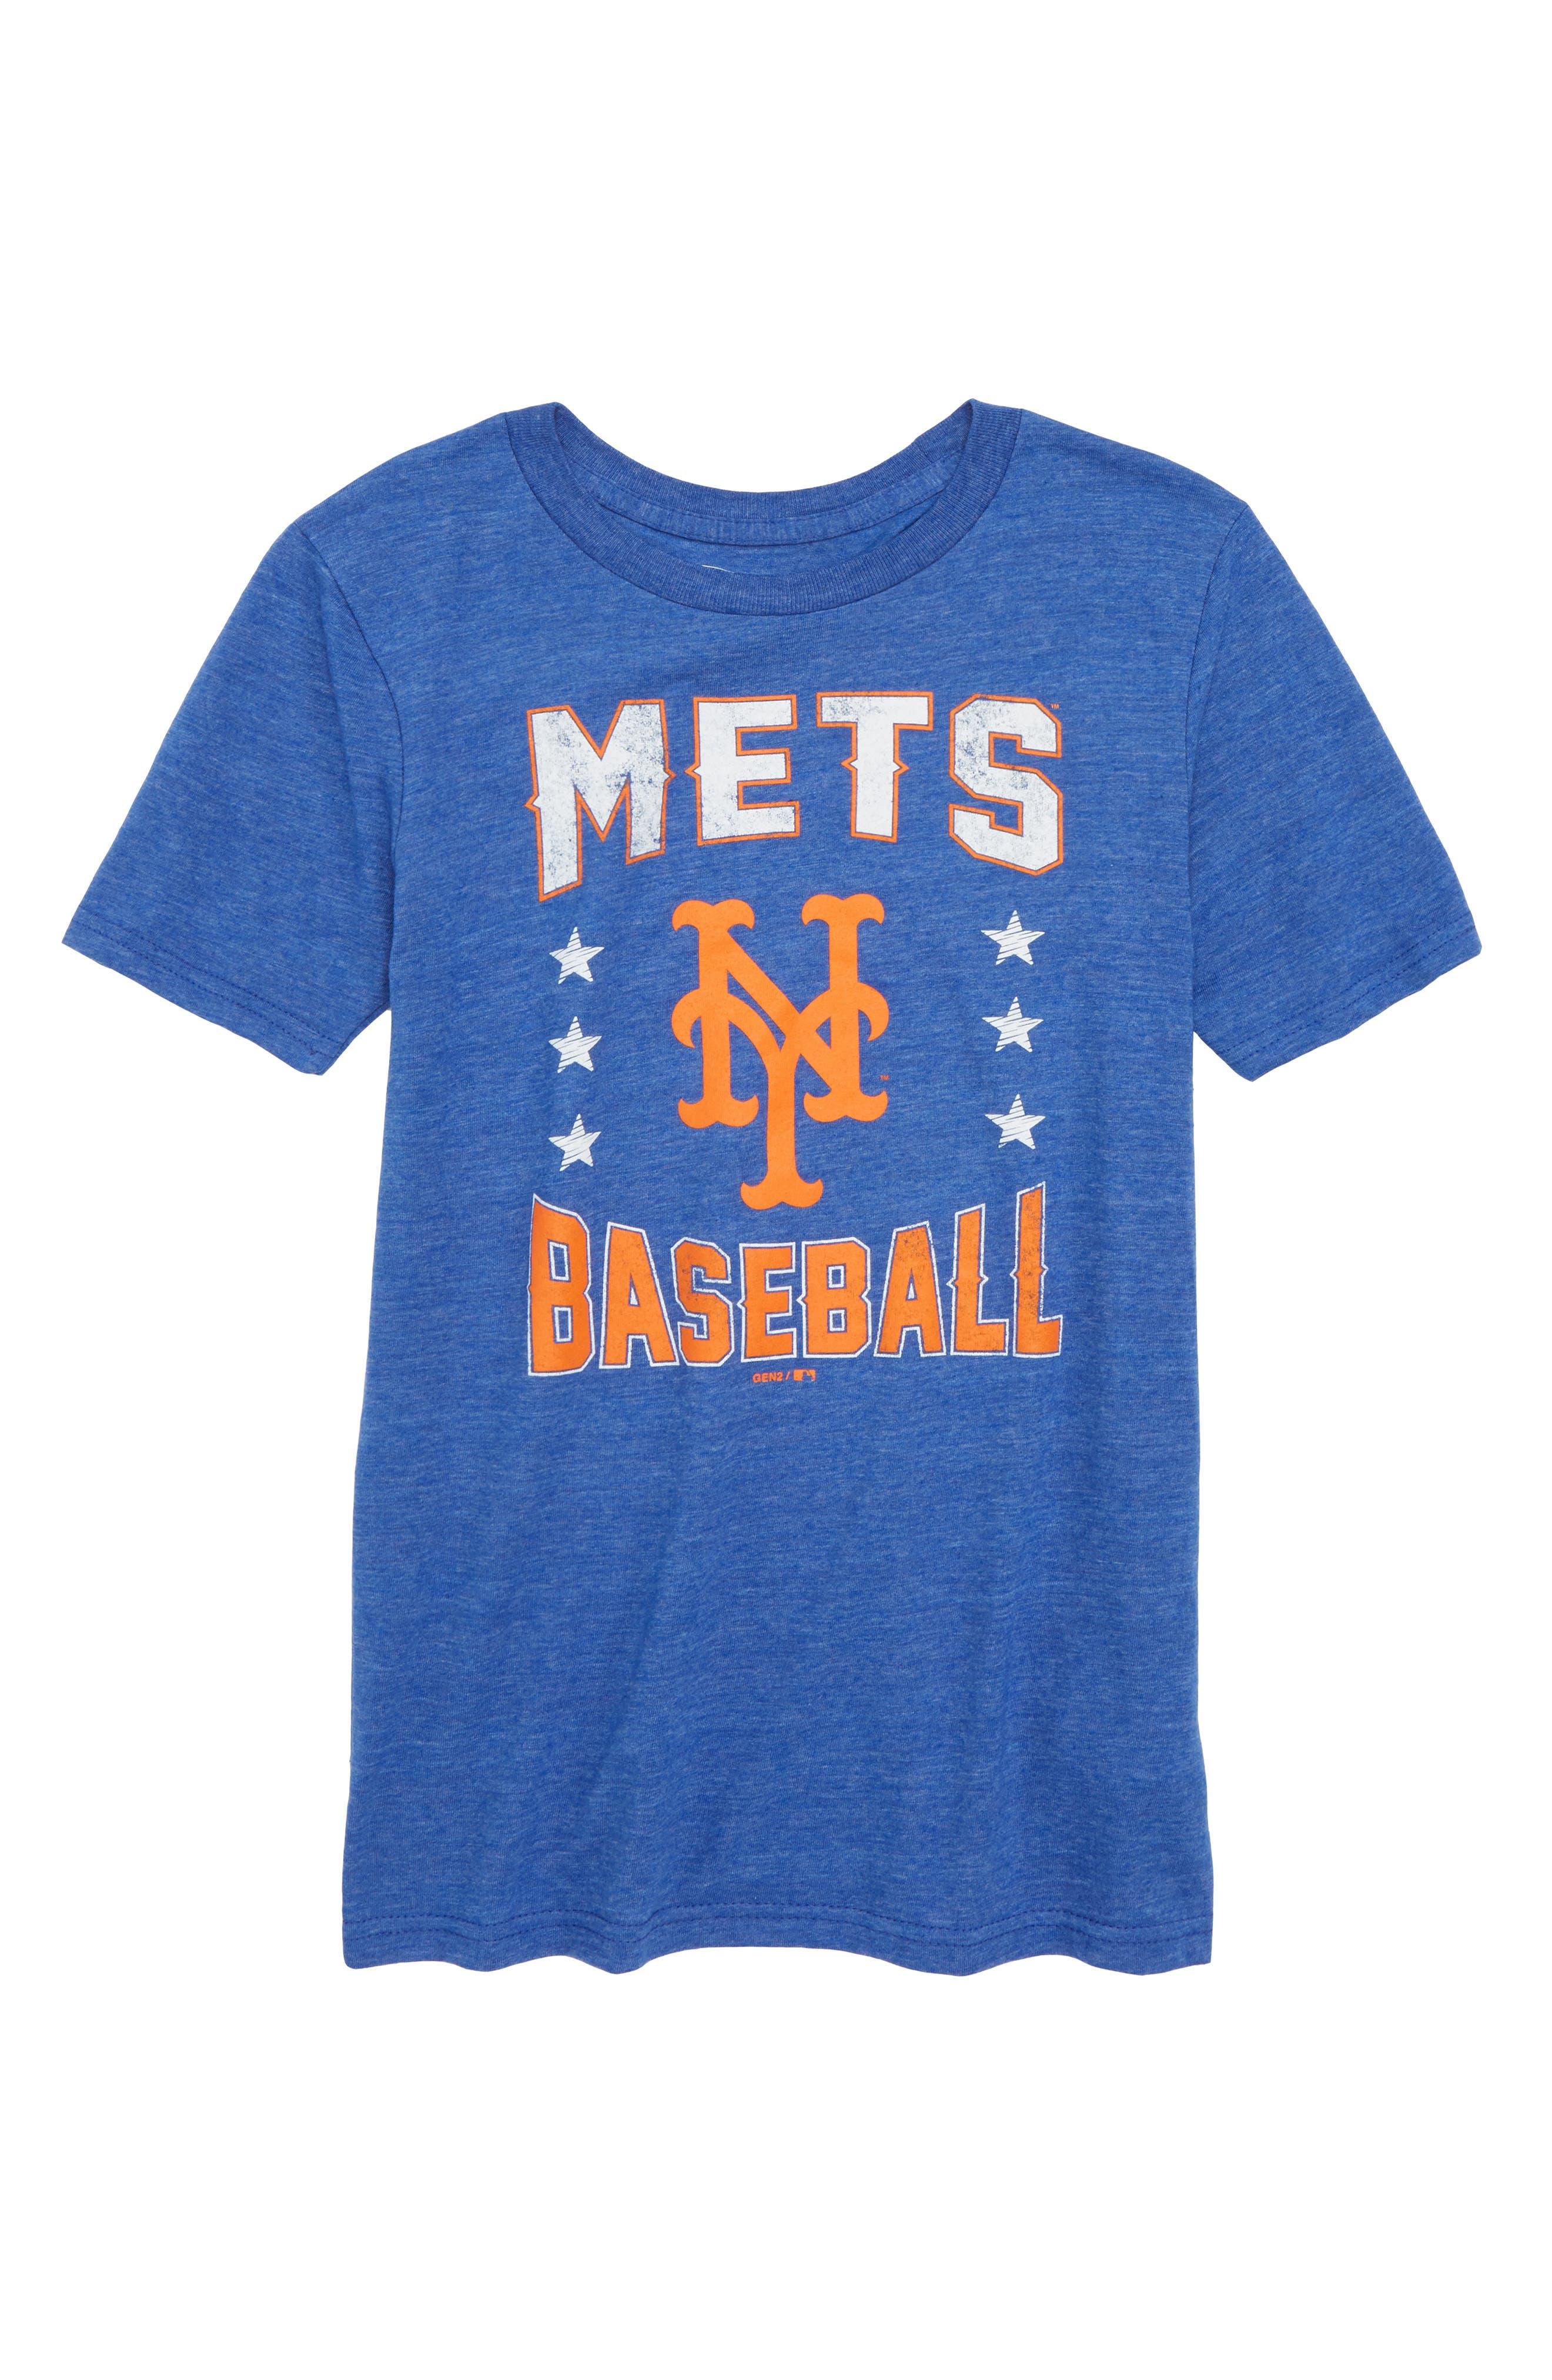 New York Mets Triple Play T-Shirt,                         Main,                         color, Royal